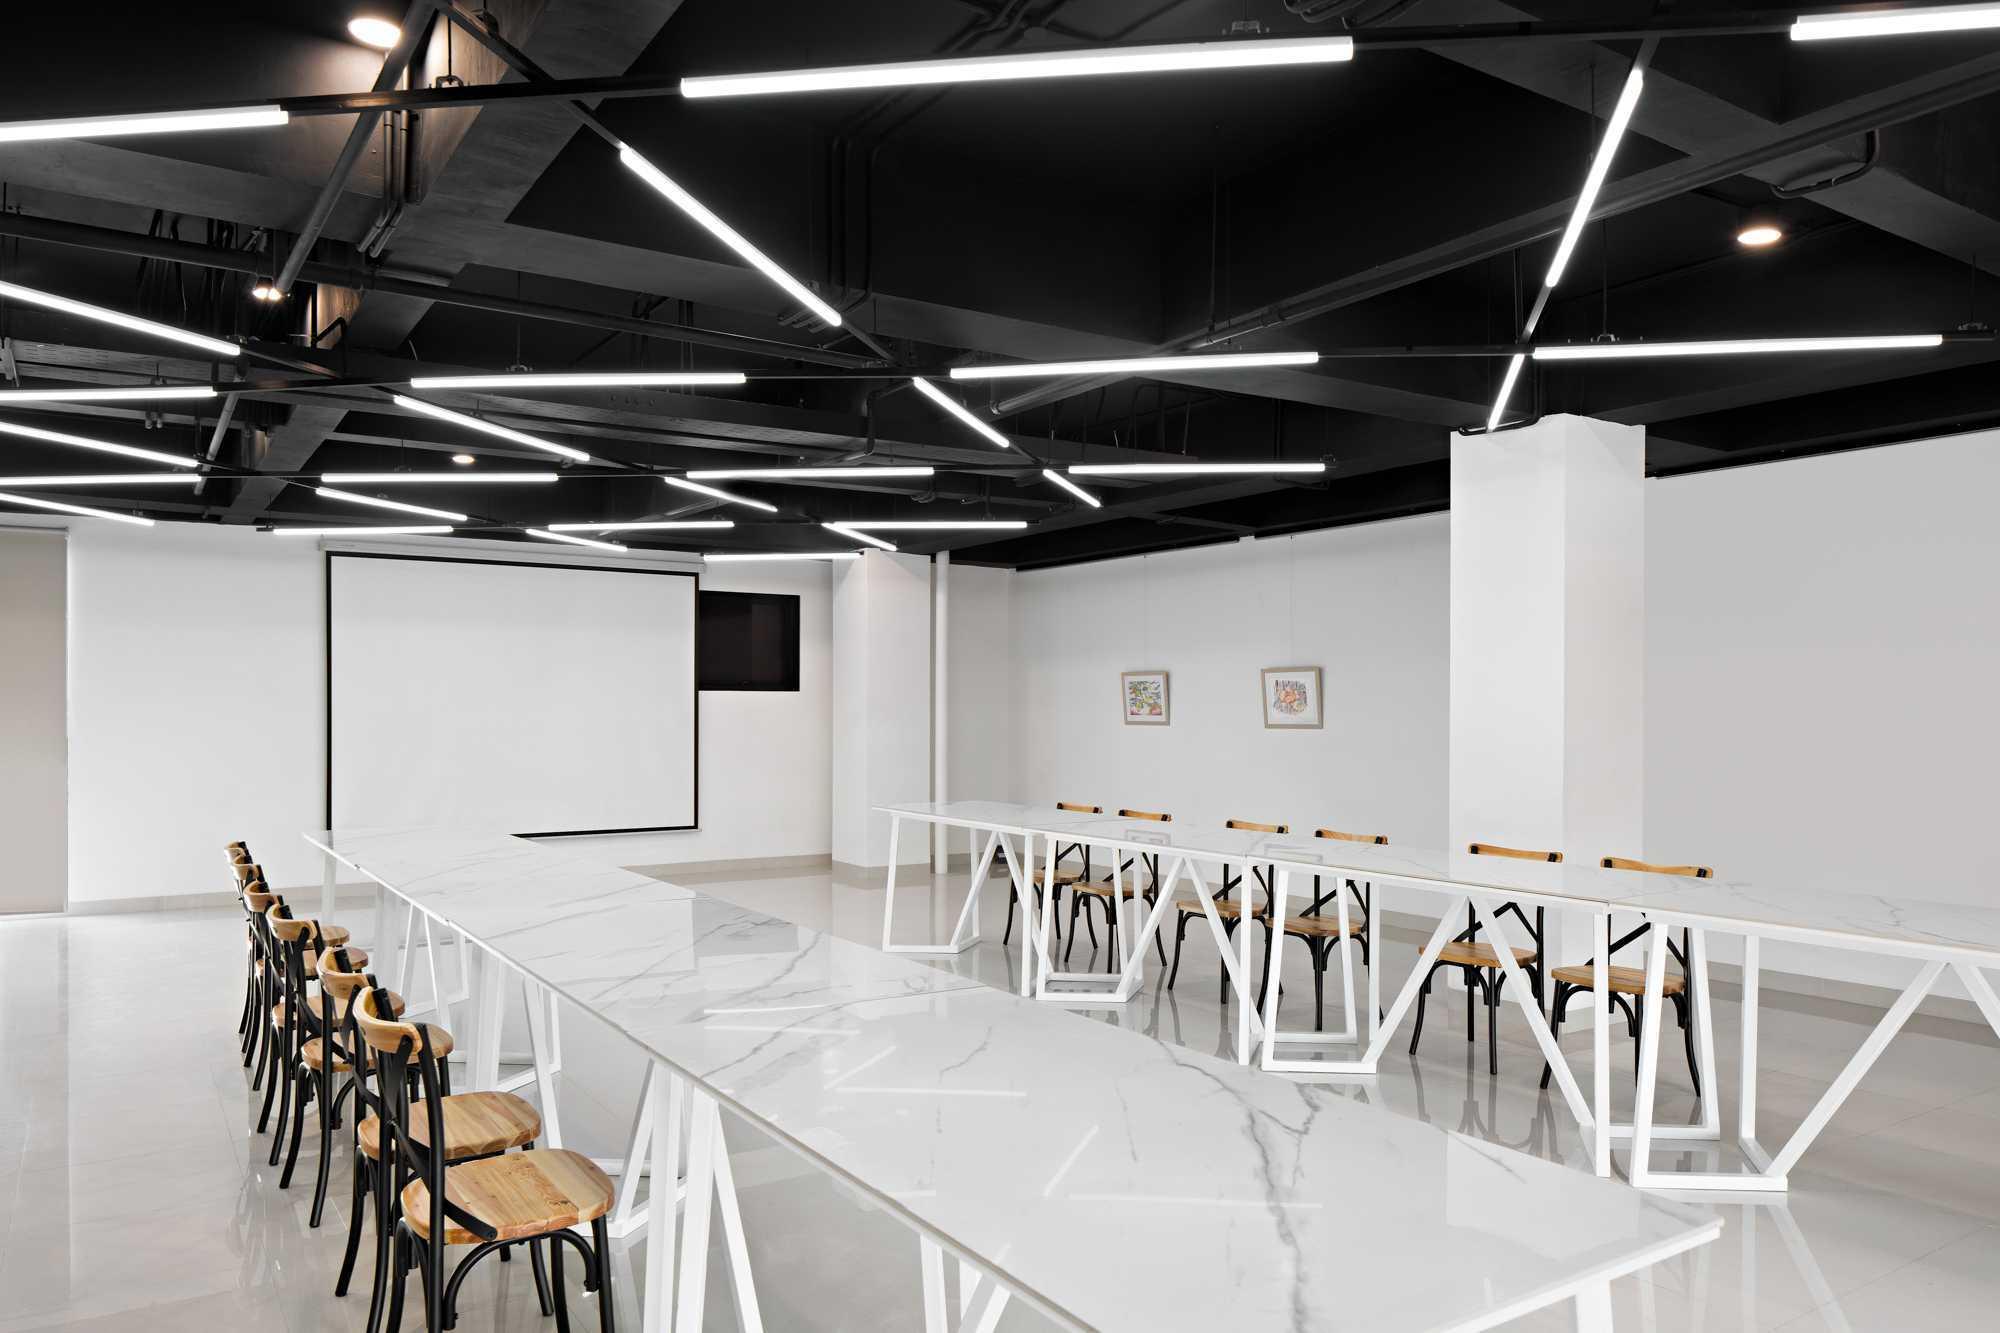 Best Group Design Studio Faber Castell International - Surabaya Surabaya, Kota Sby, Jawa Timur, Indonesia Surabaya, Kota Sby, Jawa Timur, Indonesia Best-Group-Design-Studio-Faber-Castell-International-Surabaya  88497